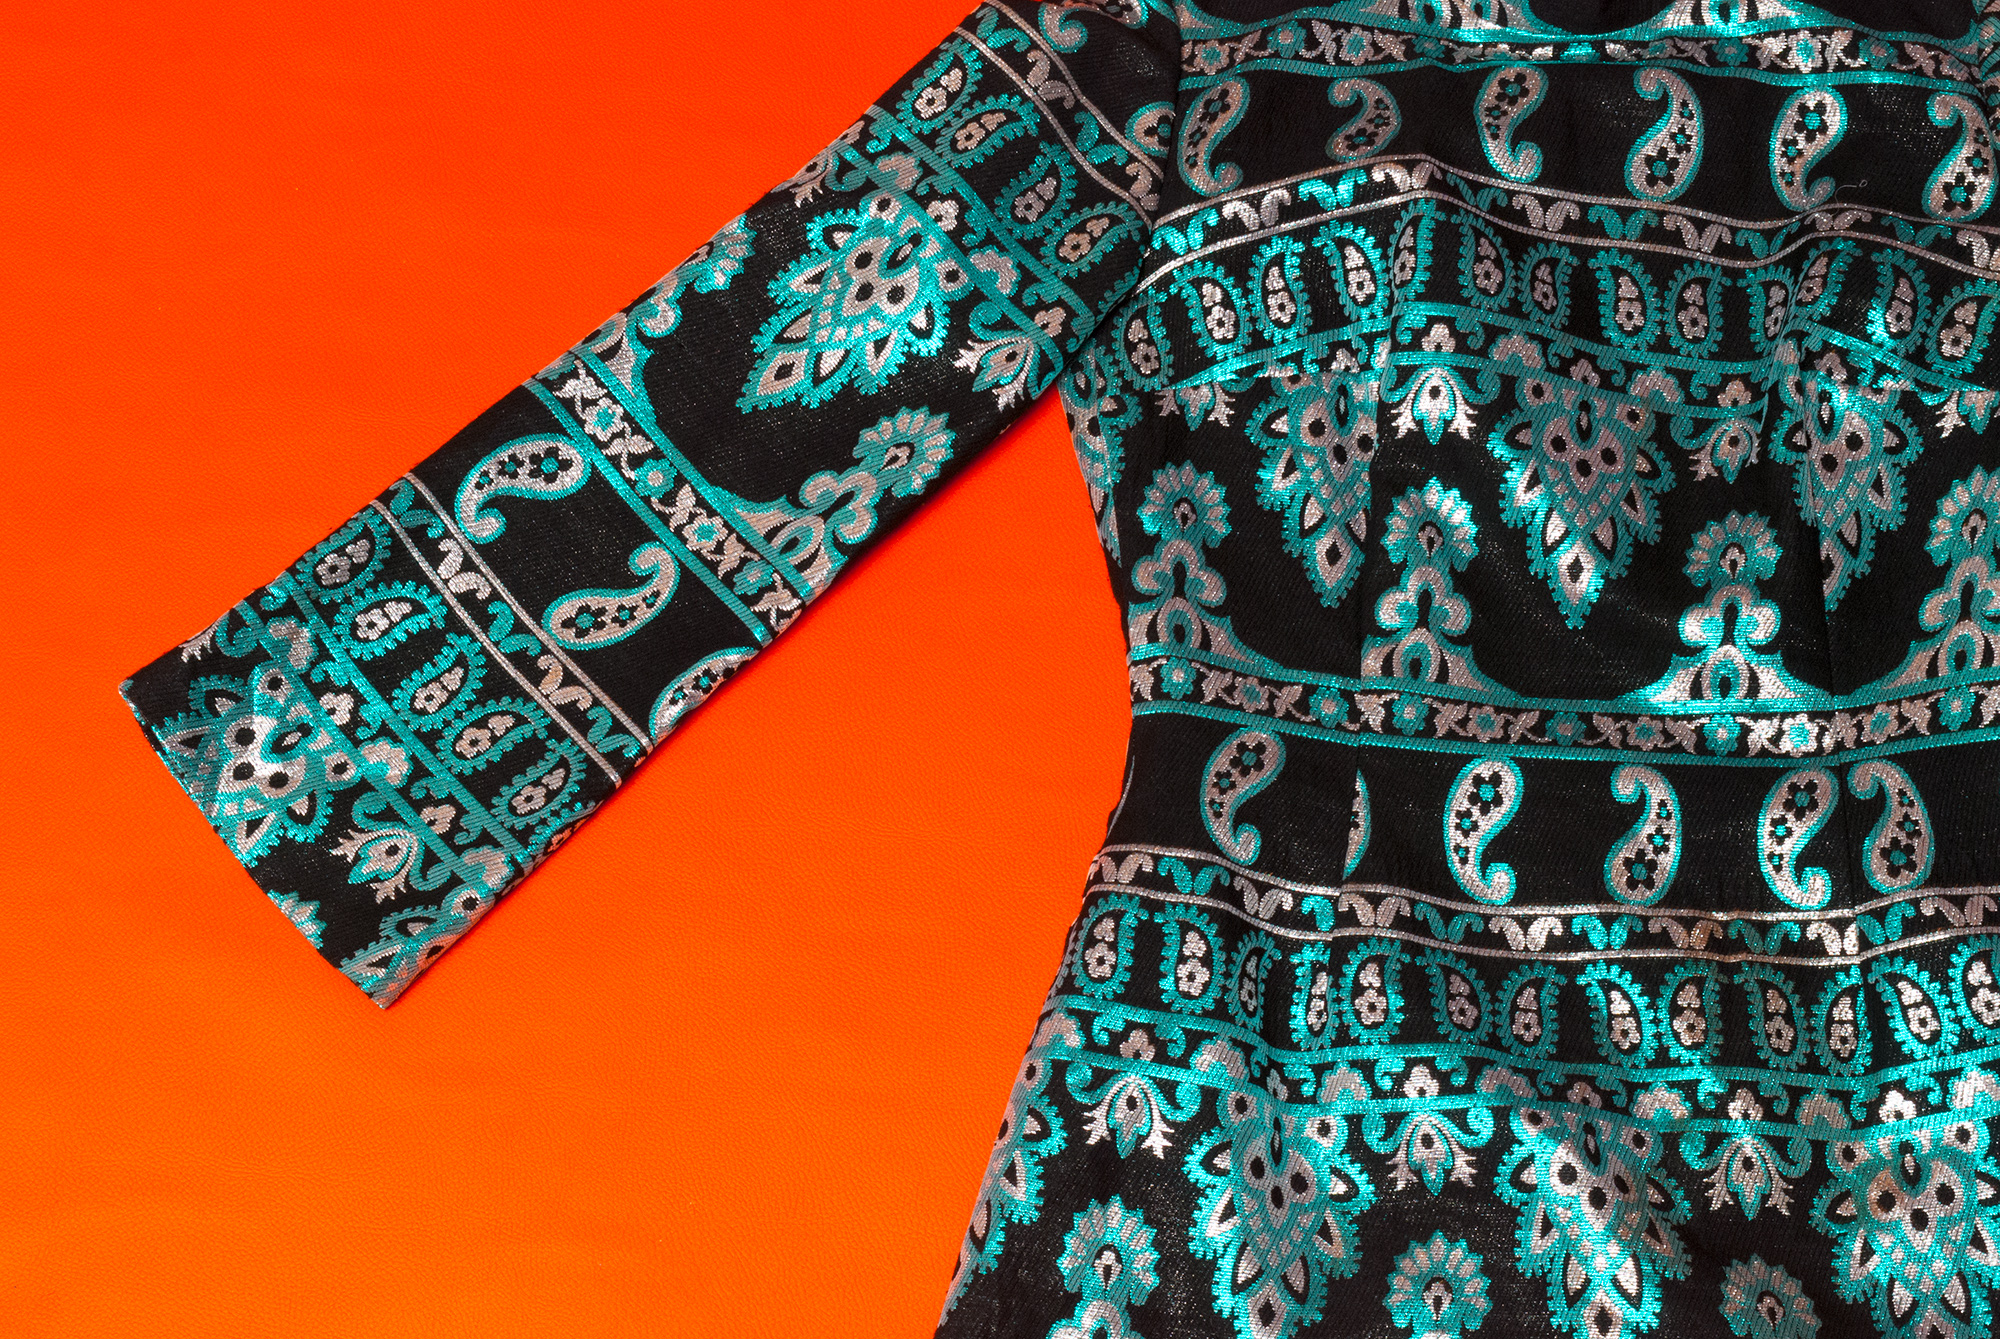 60's/70's Metallic Paisley Mini Dress